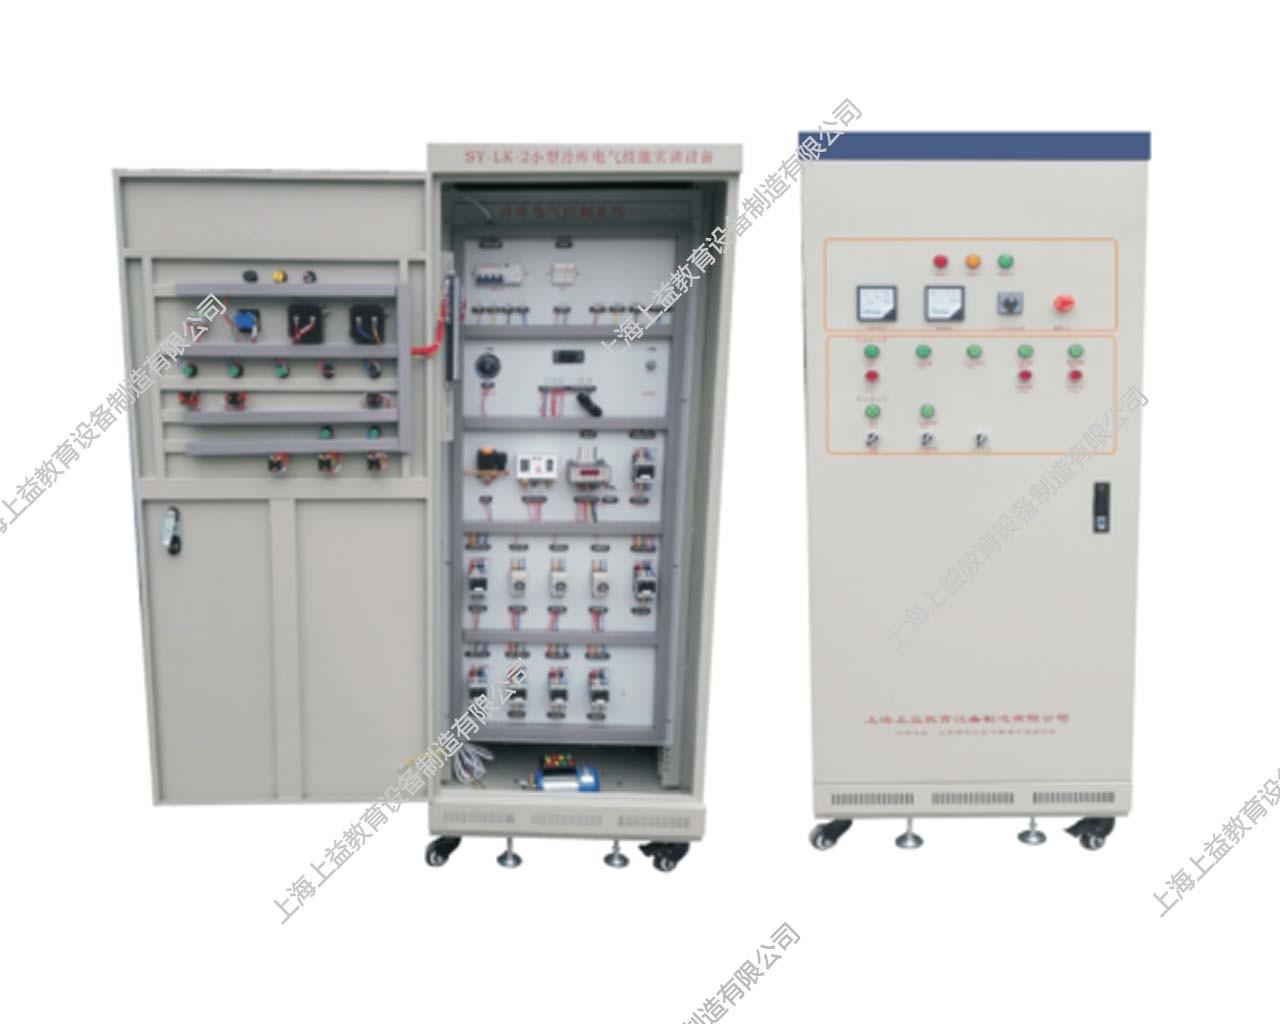 SY-LK2型 一机两库电气wwwlehu8viplehu68vip装置